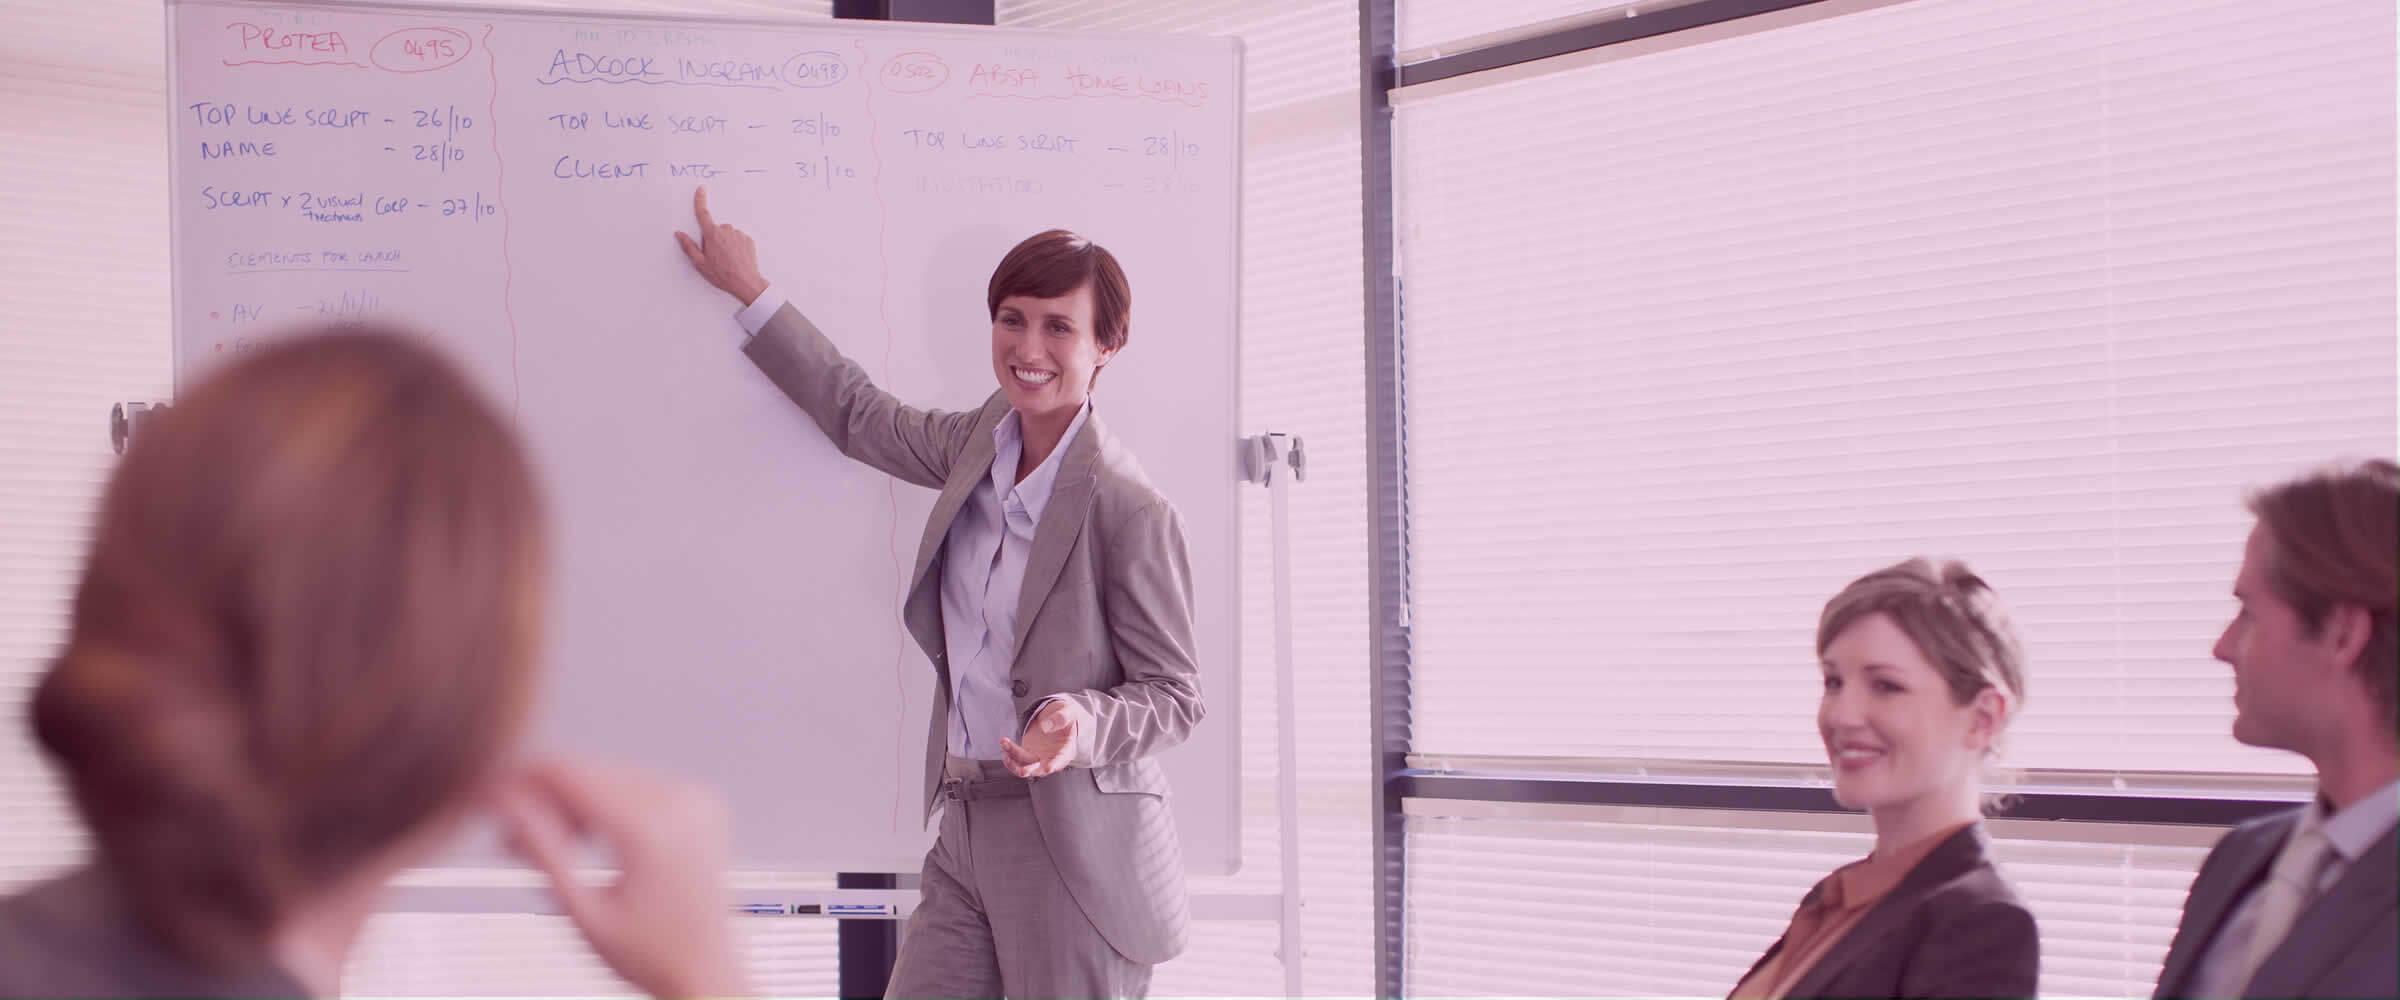 Woman teaching at whiteboard